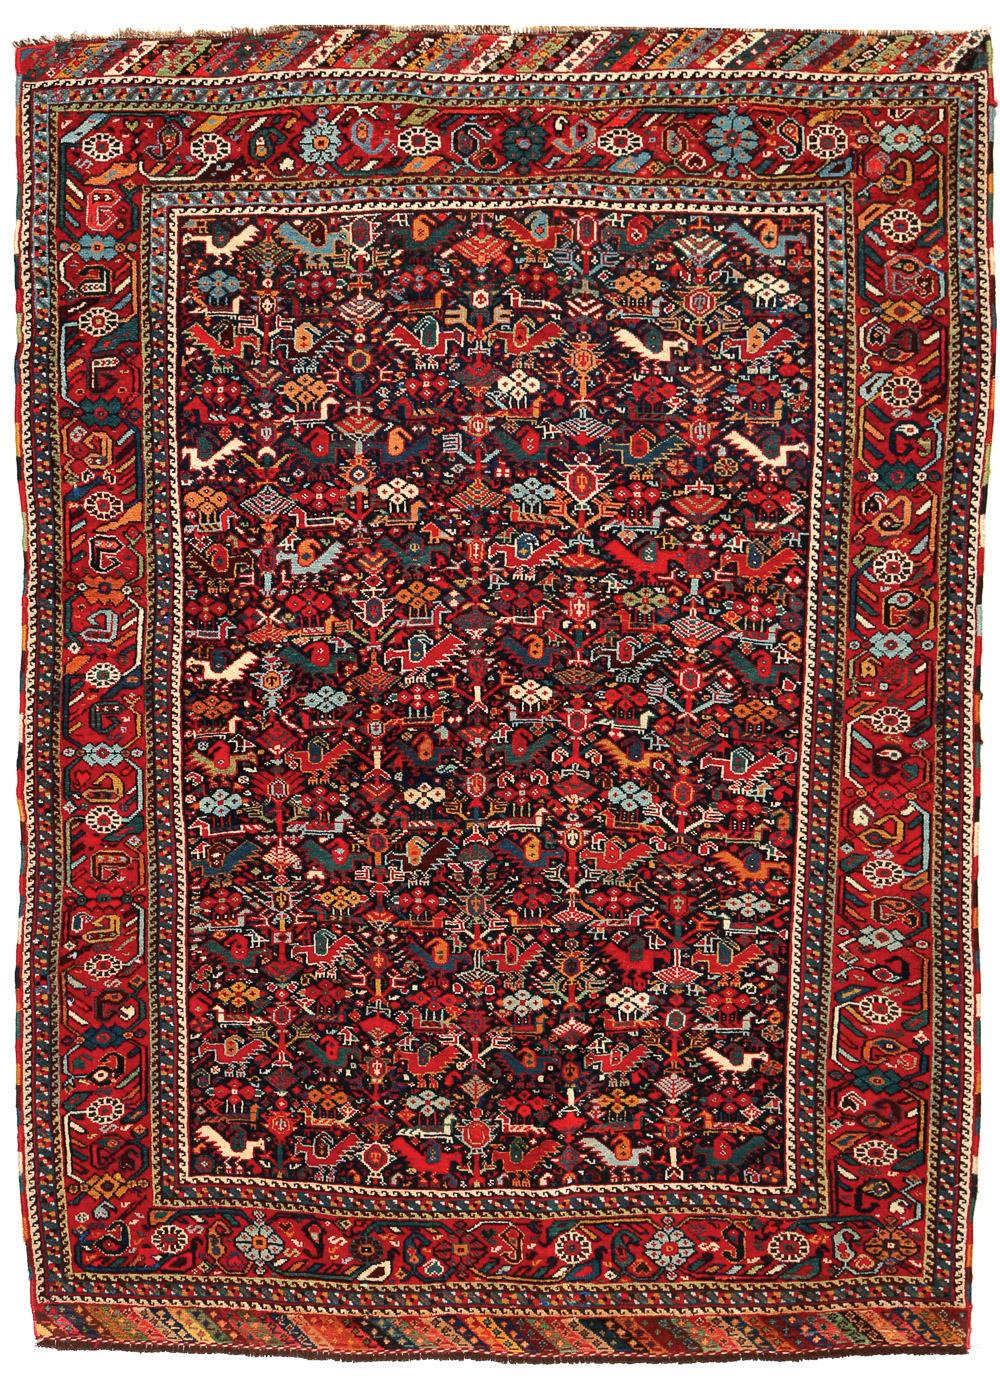 Khamseh murgh design rug, 137 x 194 cm